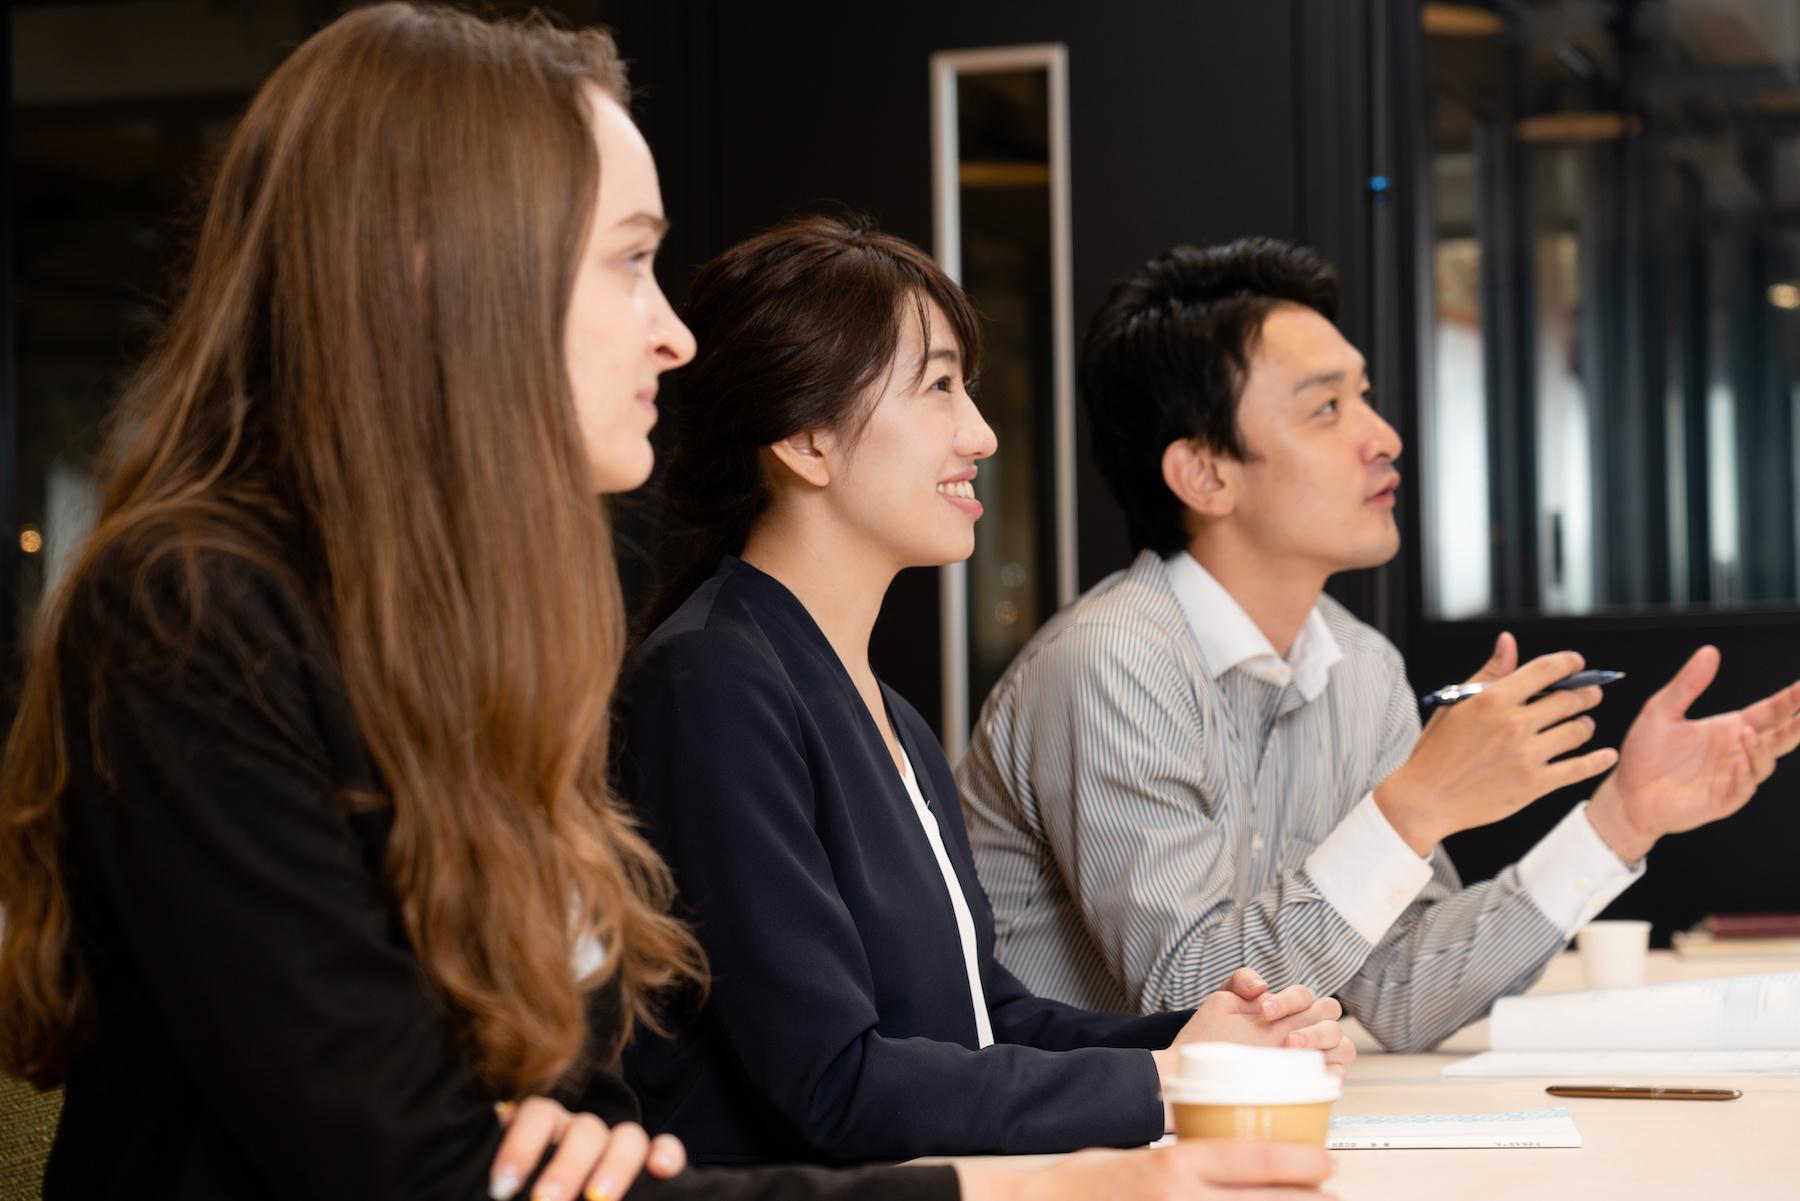 Business English Classes in Colorado – Executive English Classes